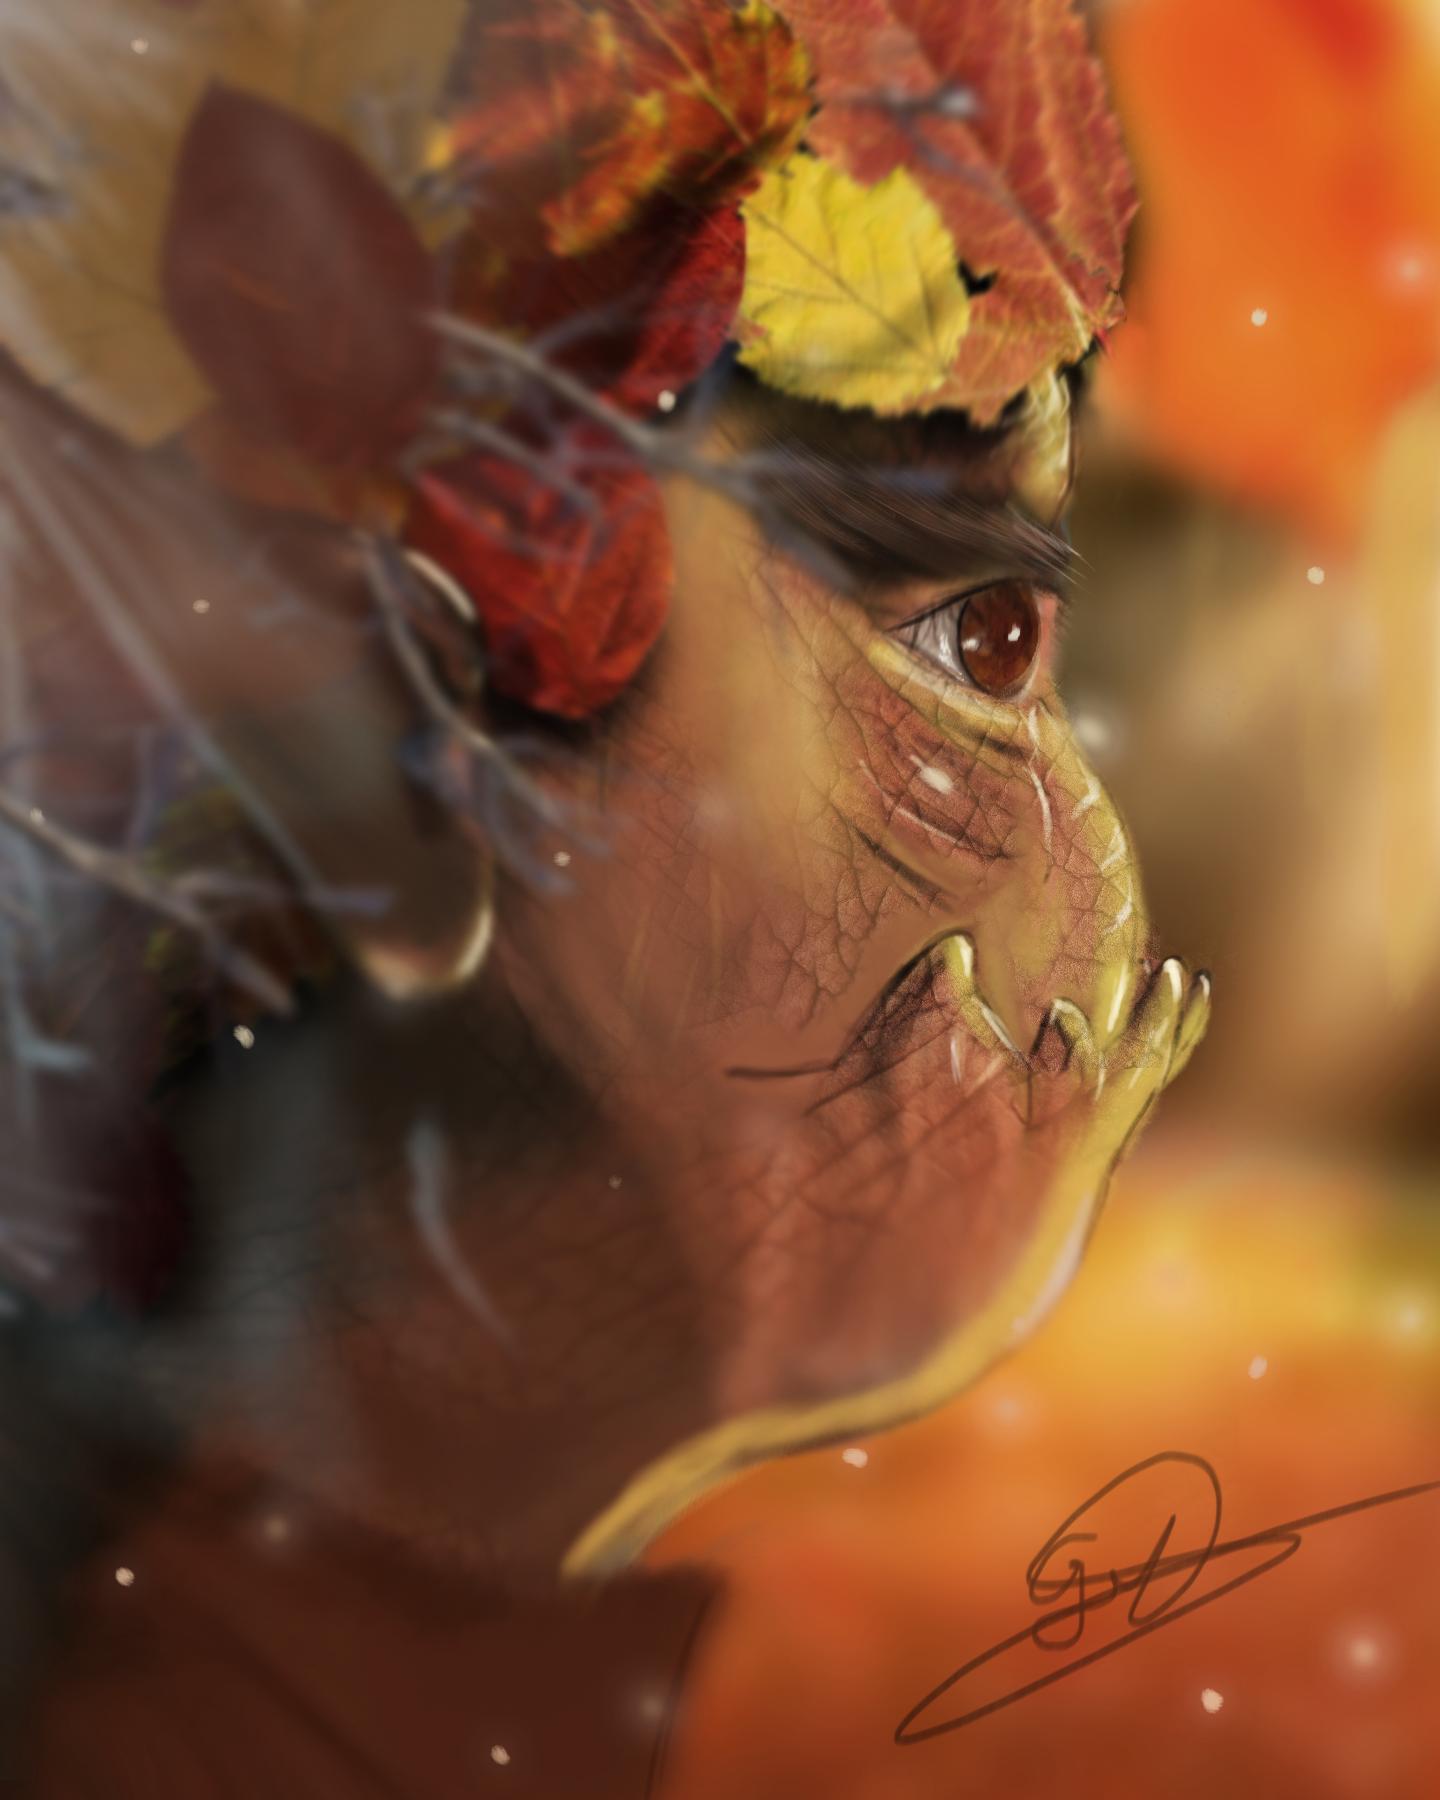 The autumn gnome